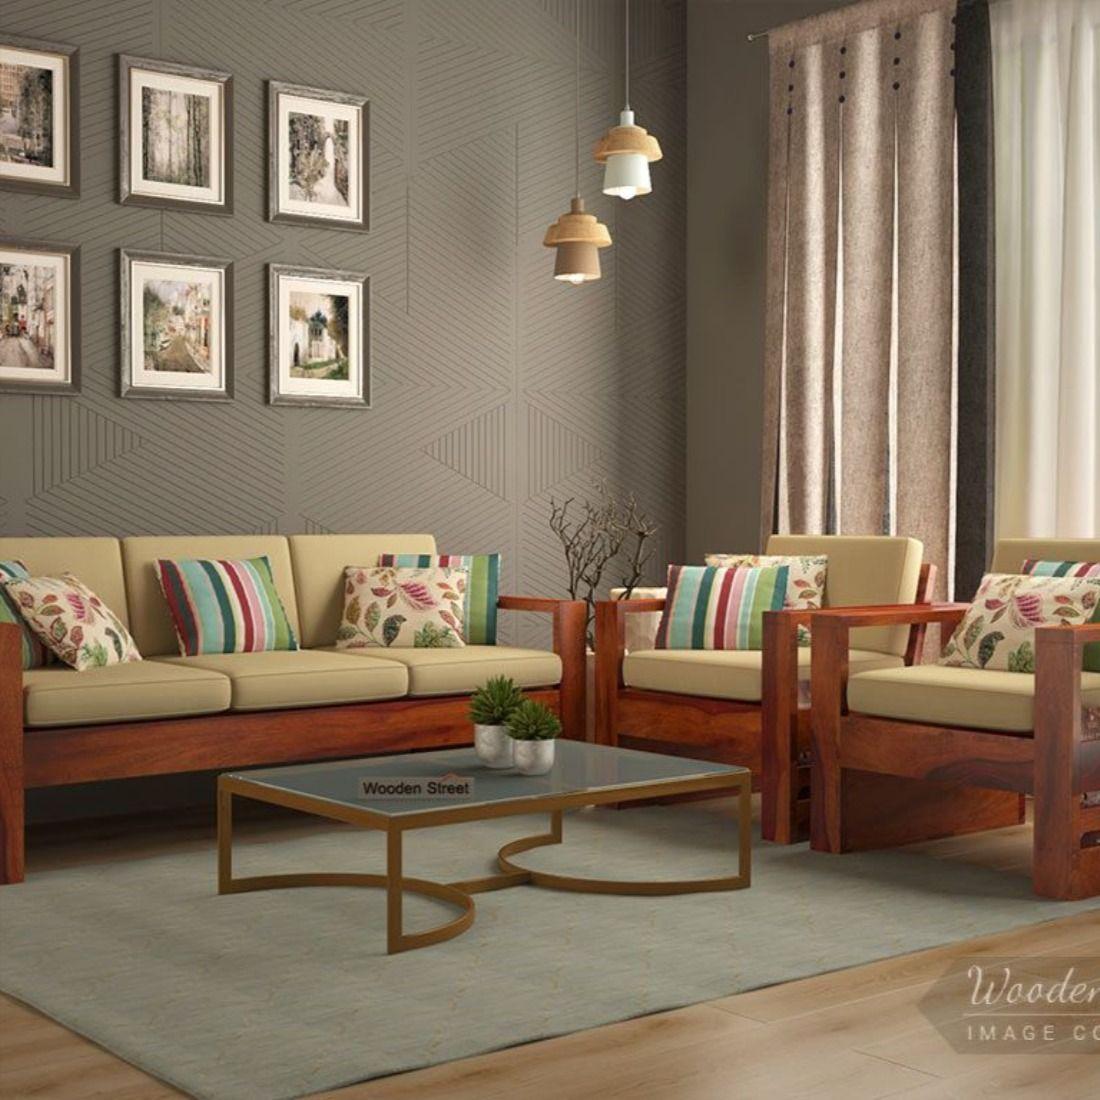 Pune In 2020 Wooden Sofa Designs Sofa Design Wooden Sofa Set Designs